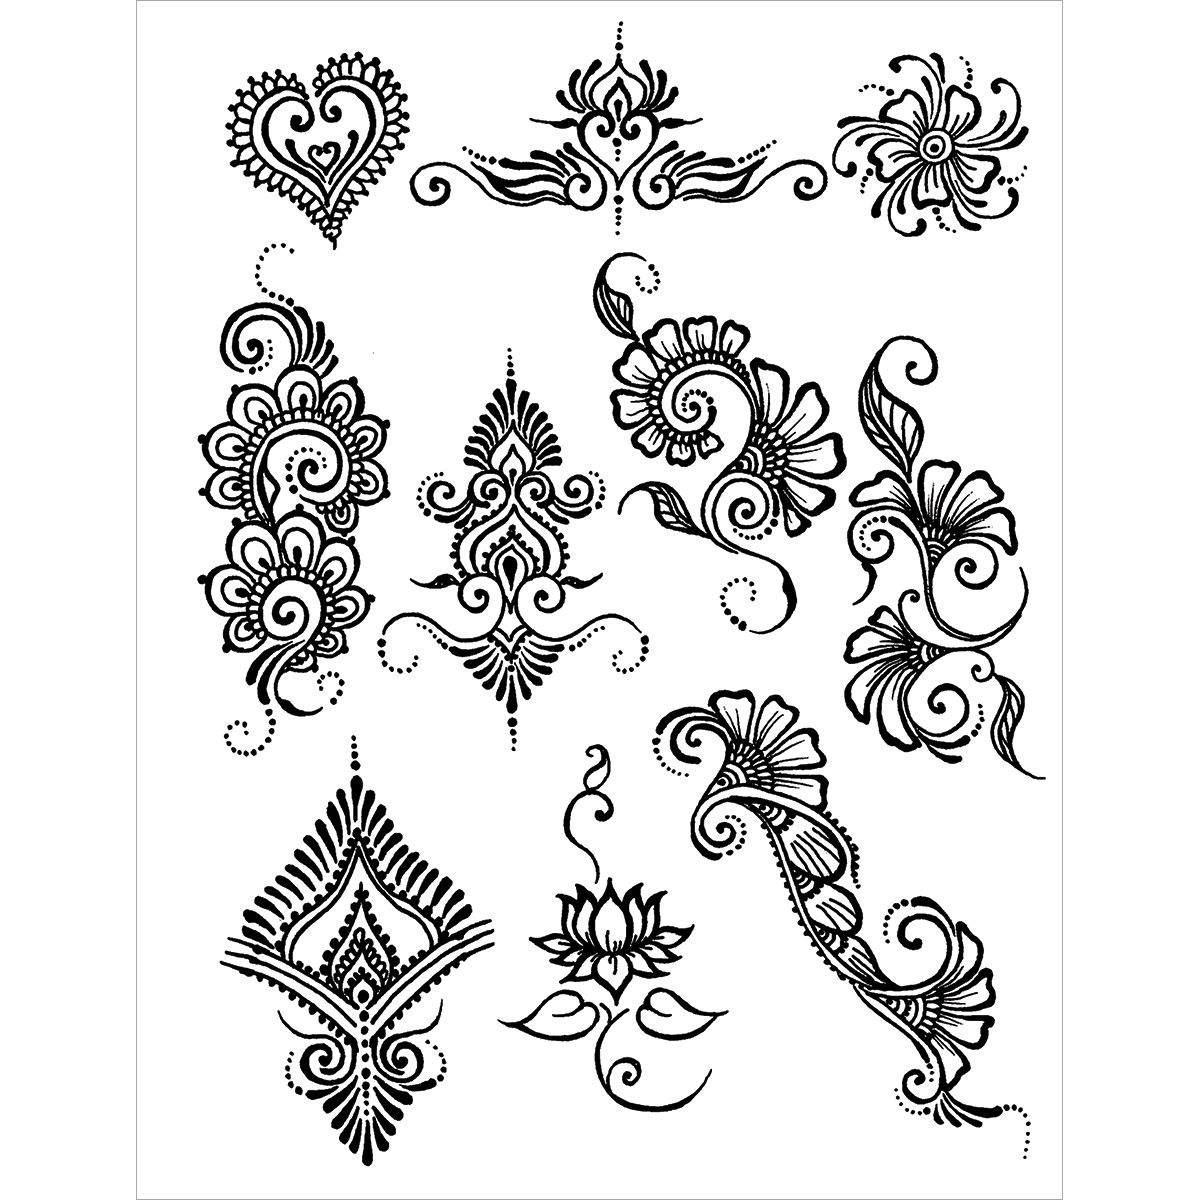 Mehndi Design Line Art : Mehndi designs drawings google search tattoos